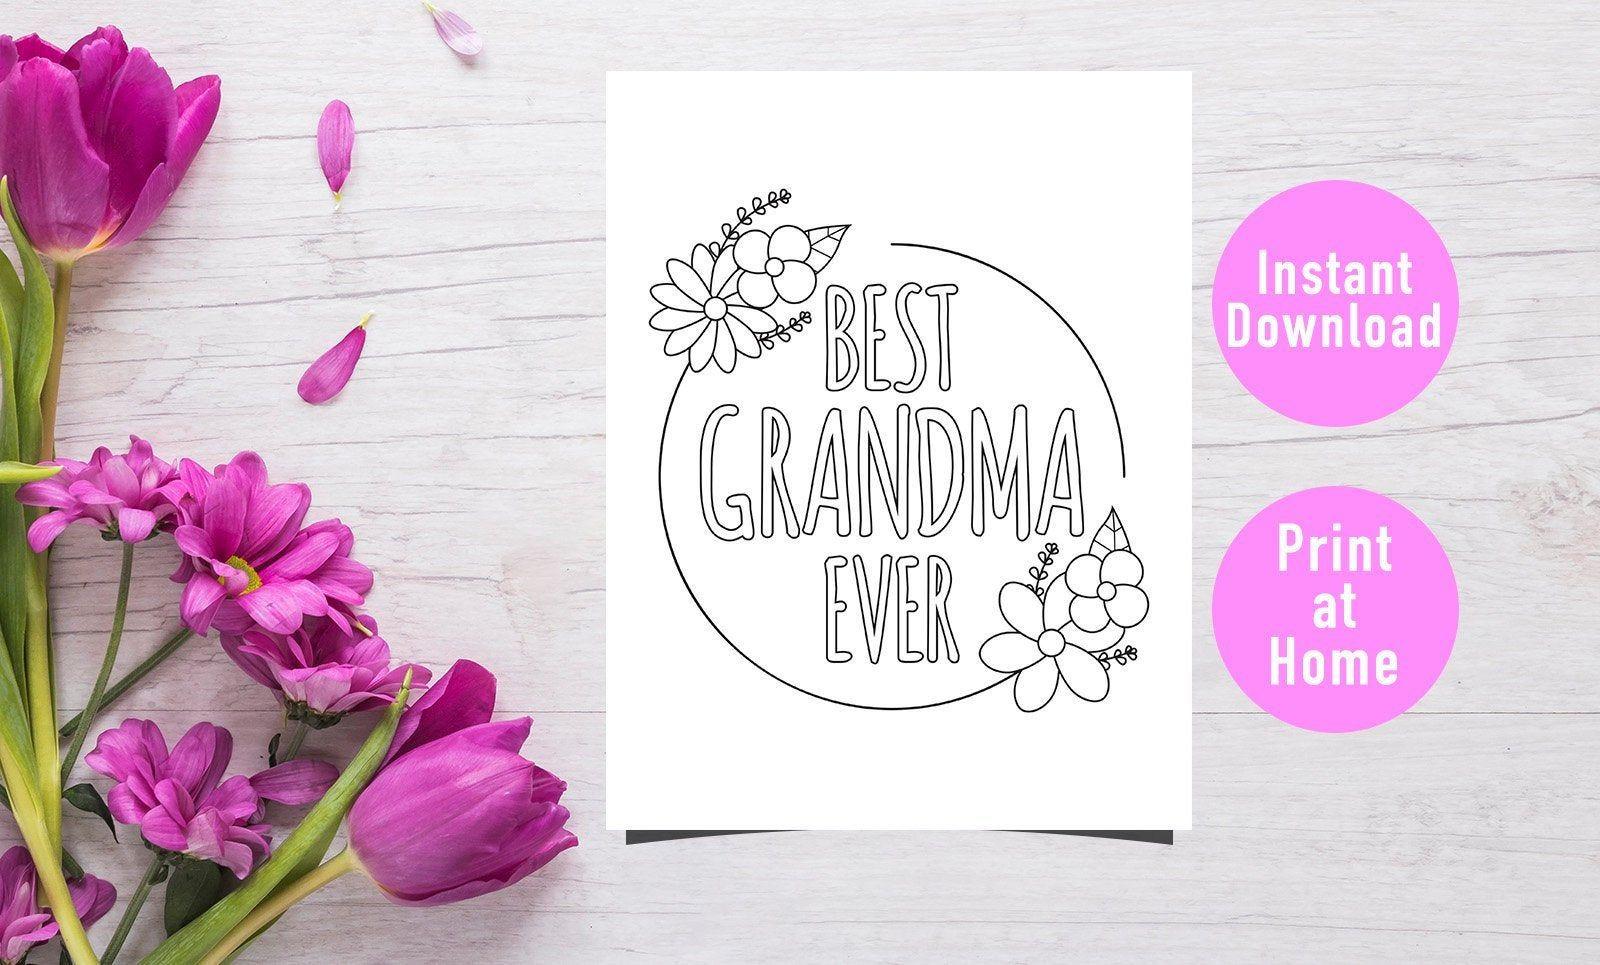 Best Grandma Ever Coloring Page Grandma Gift Mother S Etsy Coloring Pages For Kids Coloring For Kids Coloring Pages